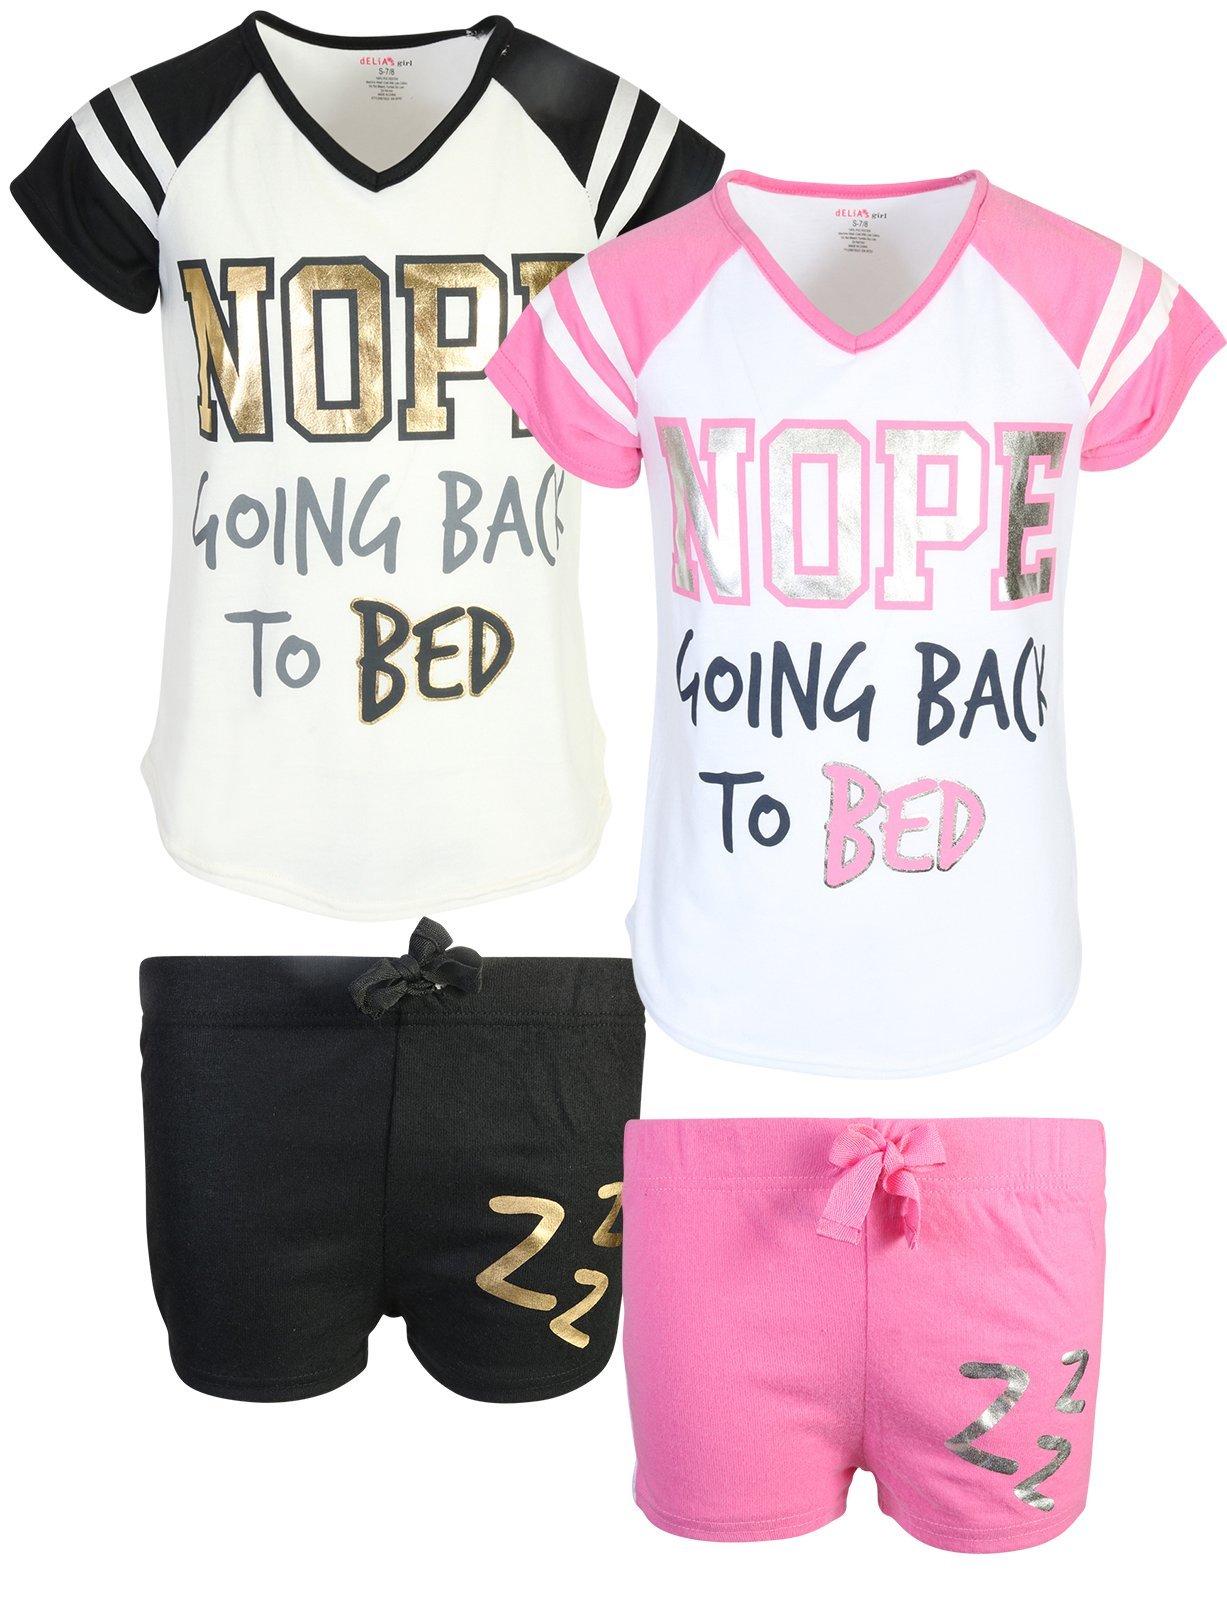 dELiA*s dELiAs Girl's Varisity Pajama Sleepwear Short Set, Going to Bed, Size 10/12' by dELiA*s